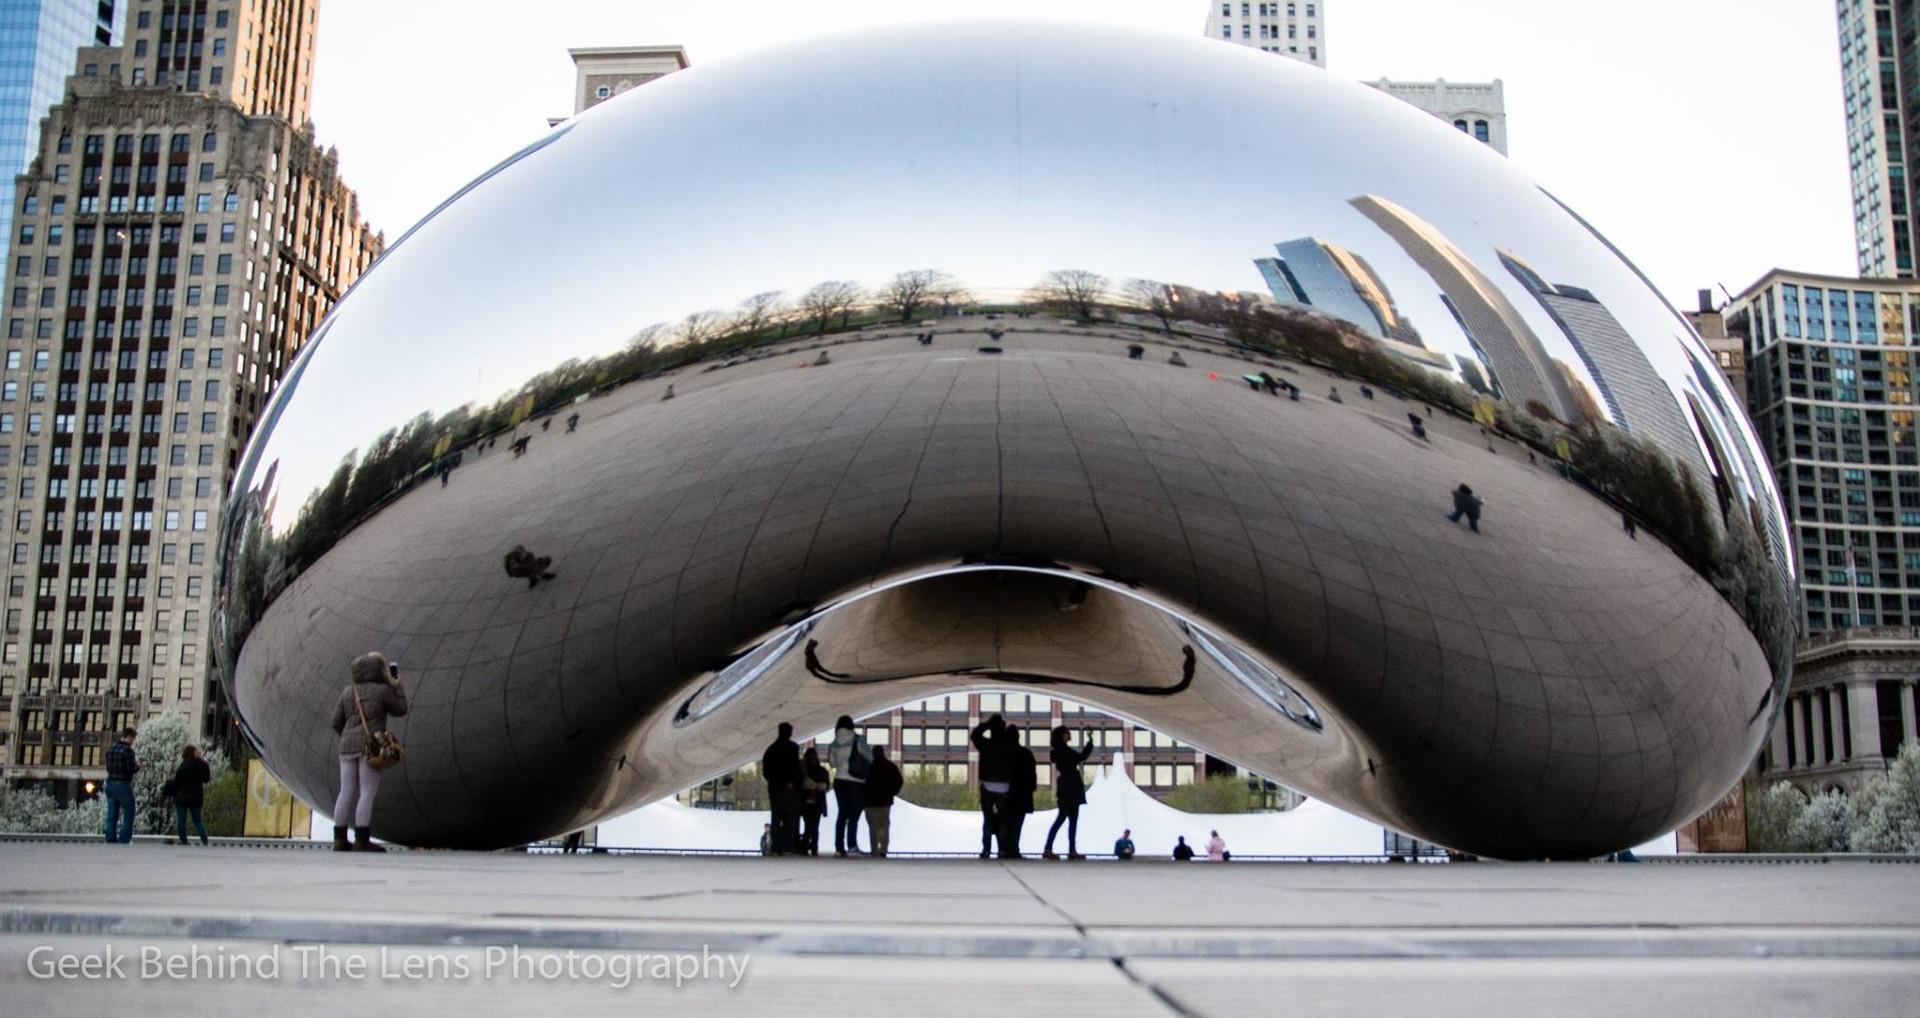 The Bean at Millenium Gate